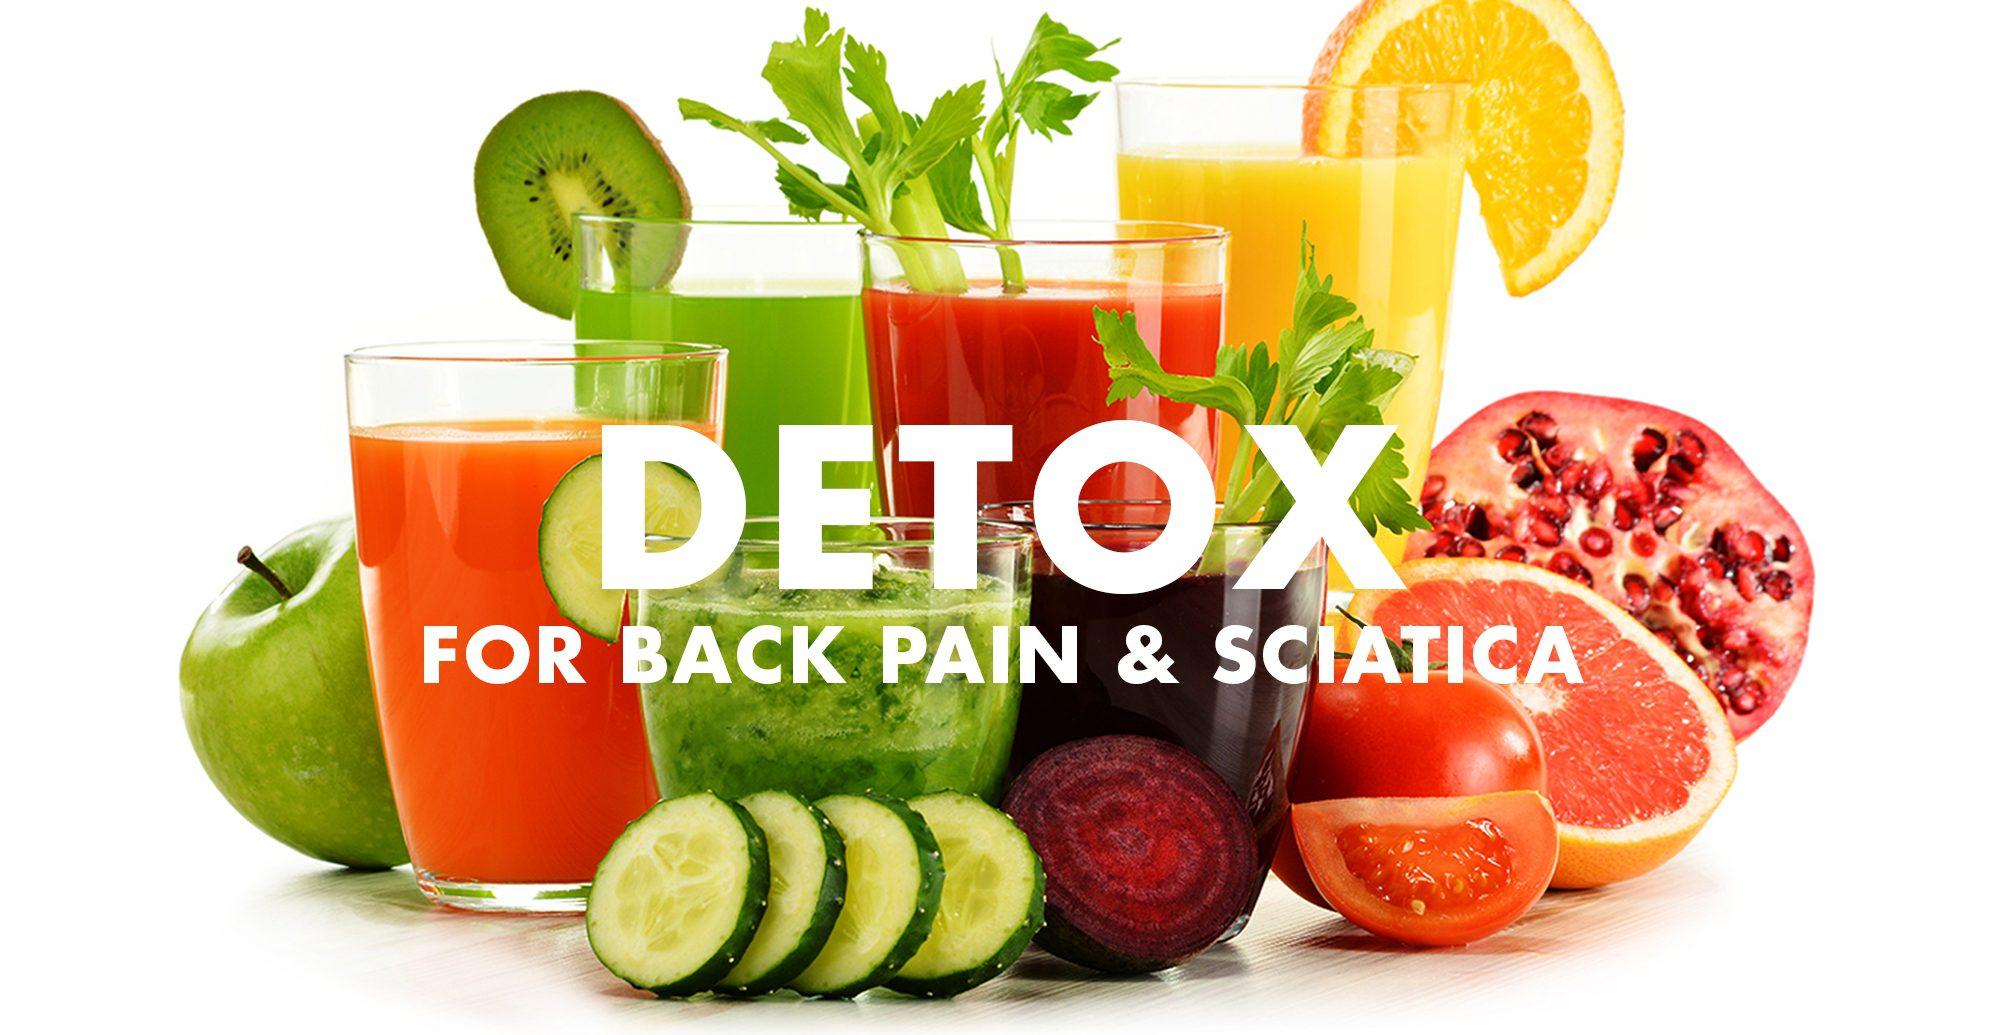 Detox for Back Pain and Sciatica | El Paso, TX Chiropractor